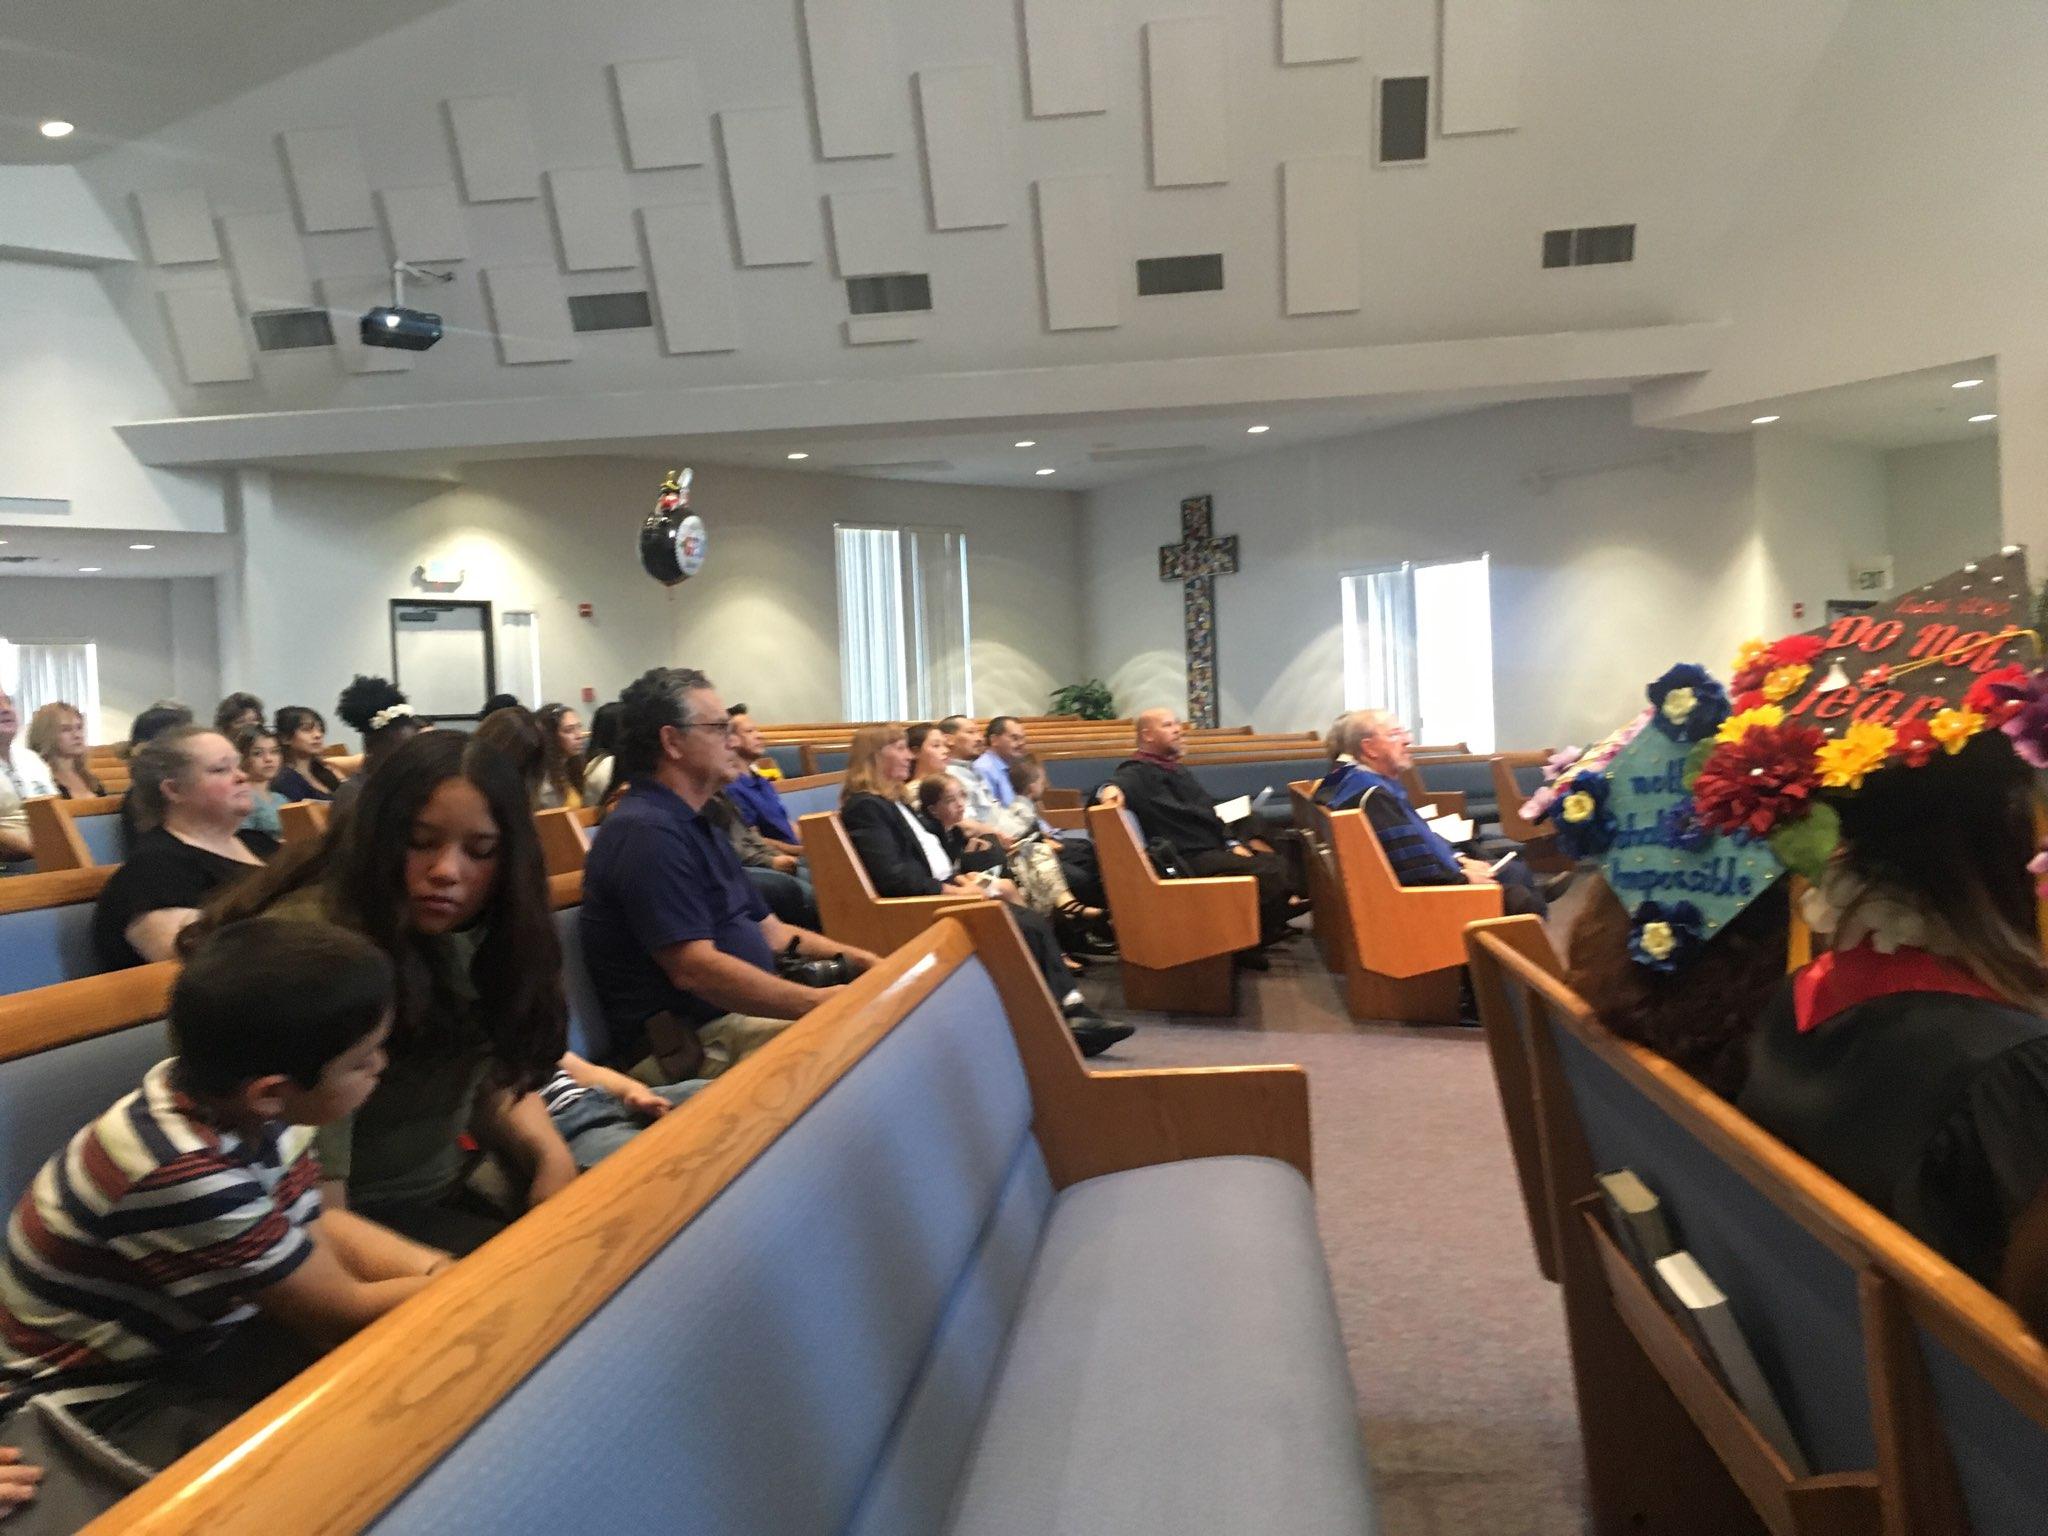 Graduation 2019 at the Rivers Church, Redlands, California